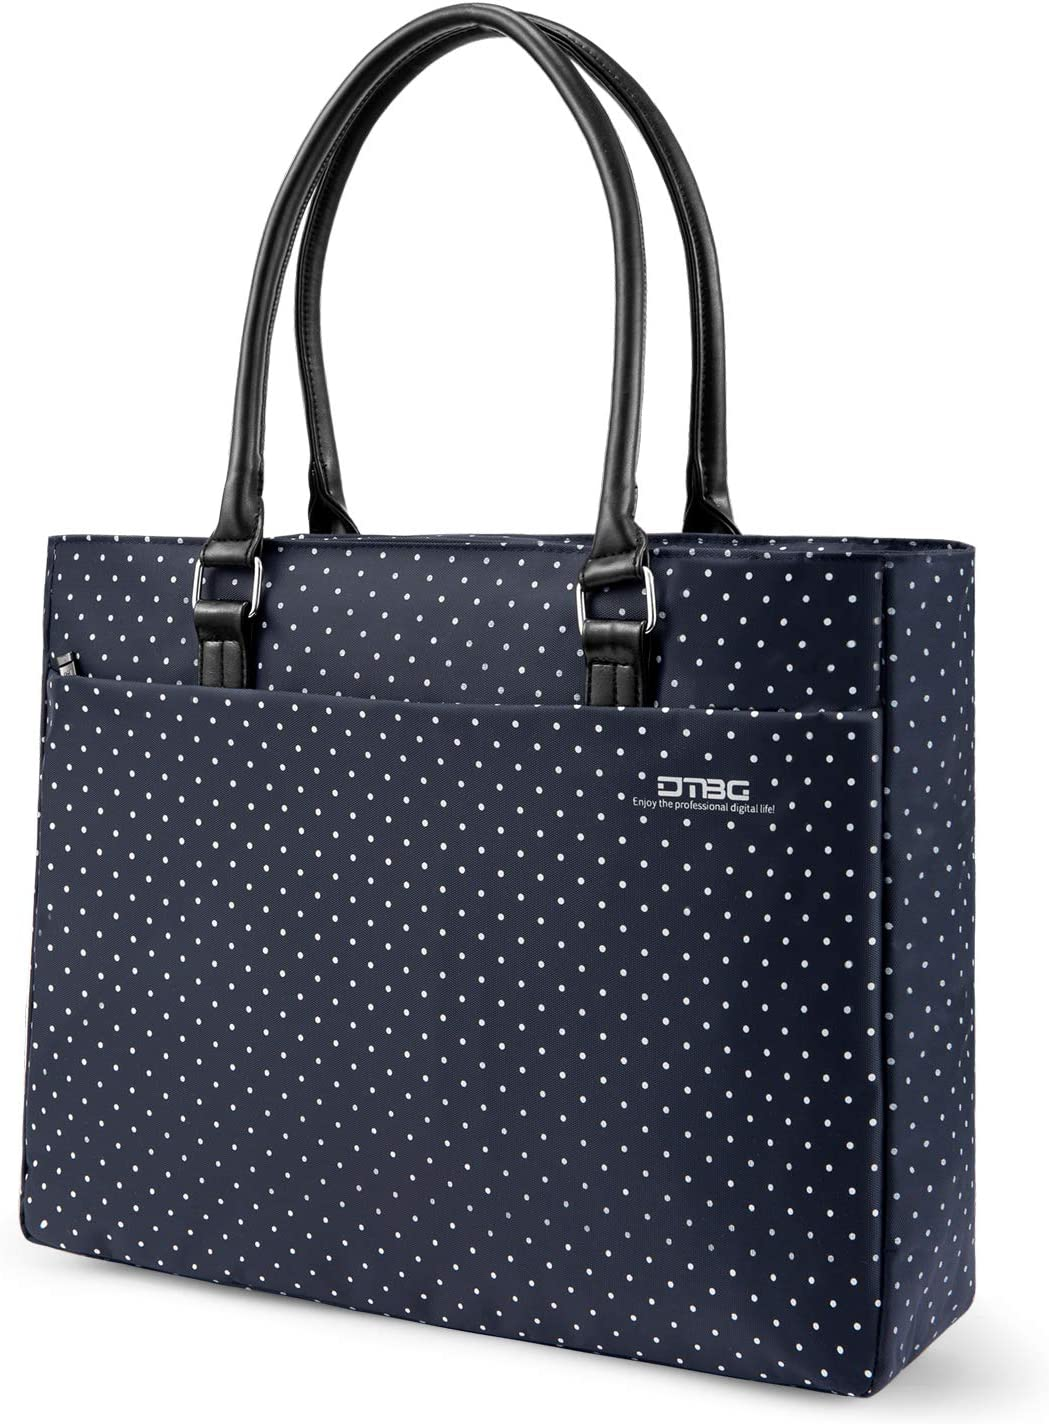 DTBG Laptop Tote Bag, 15.6 Inch Women Shoulder Bag Nylon Briefcase Casual Handbag Laptop Case for 15-15.11 Inch Tablet/Ultra-Book/MacBook/Chromebook (Blue+White Dot)